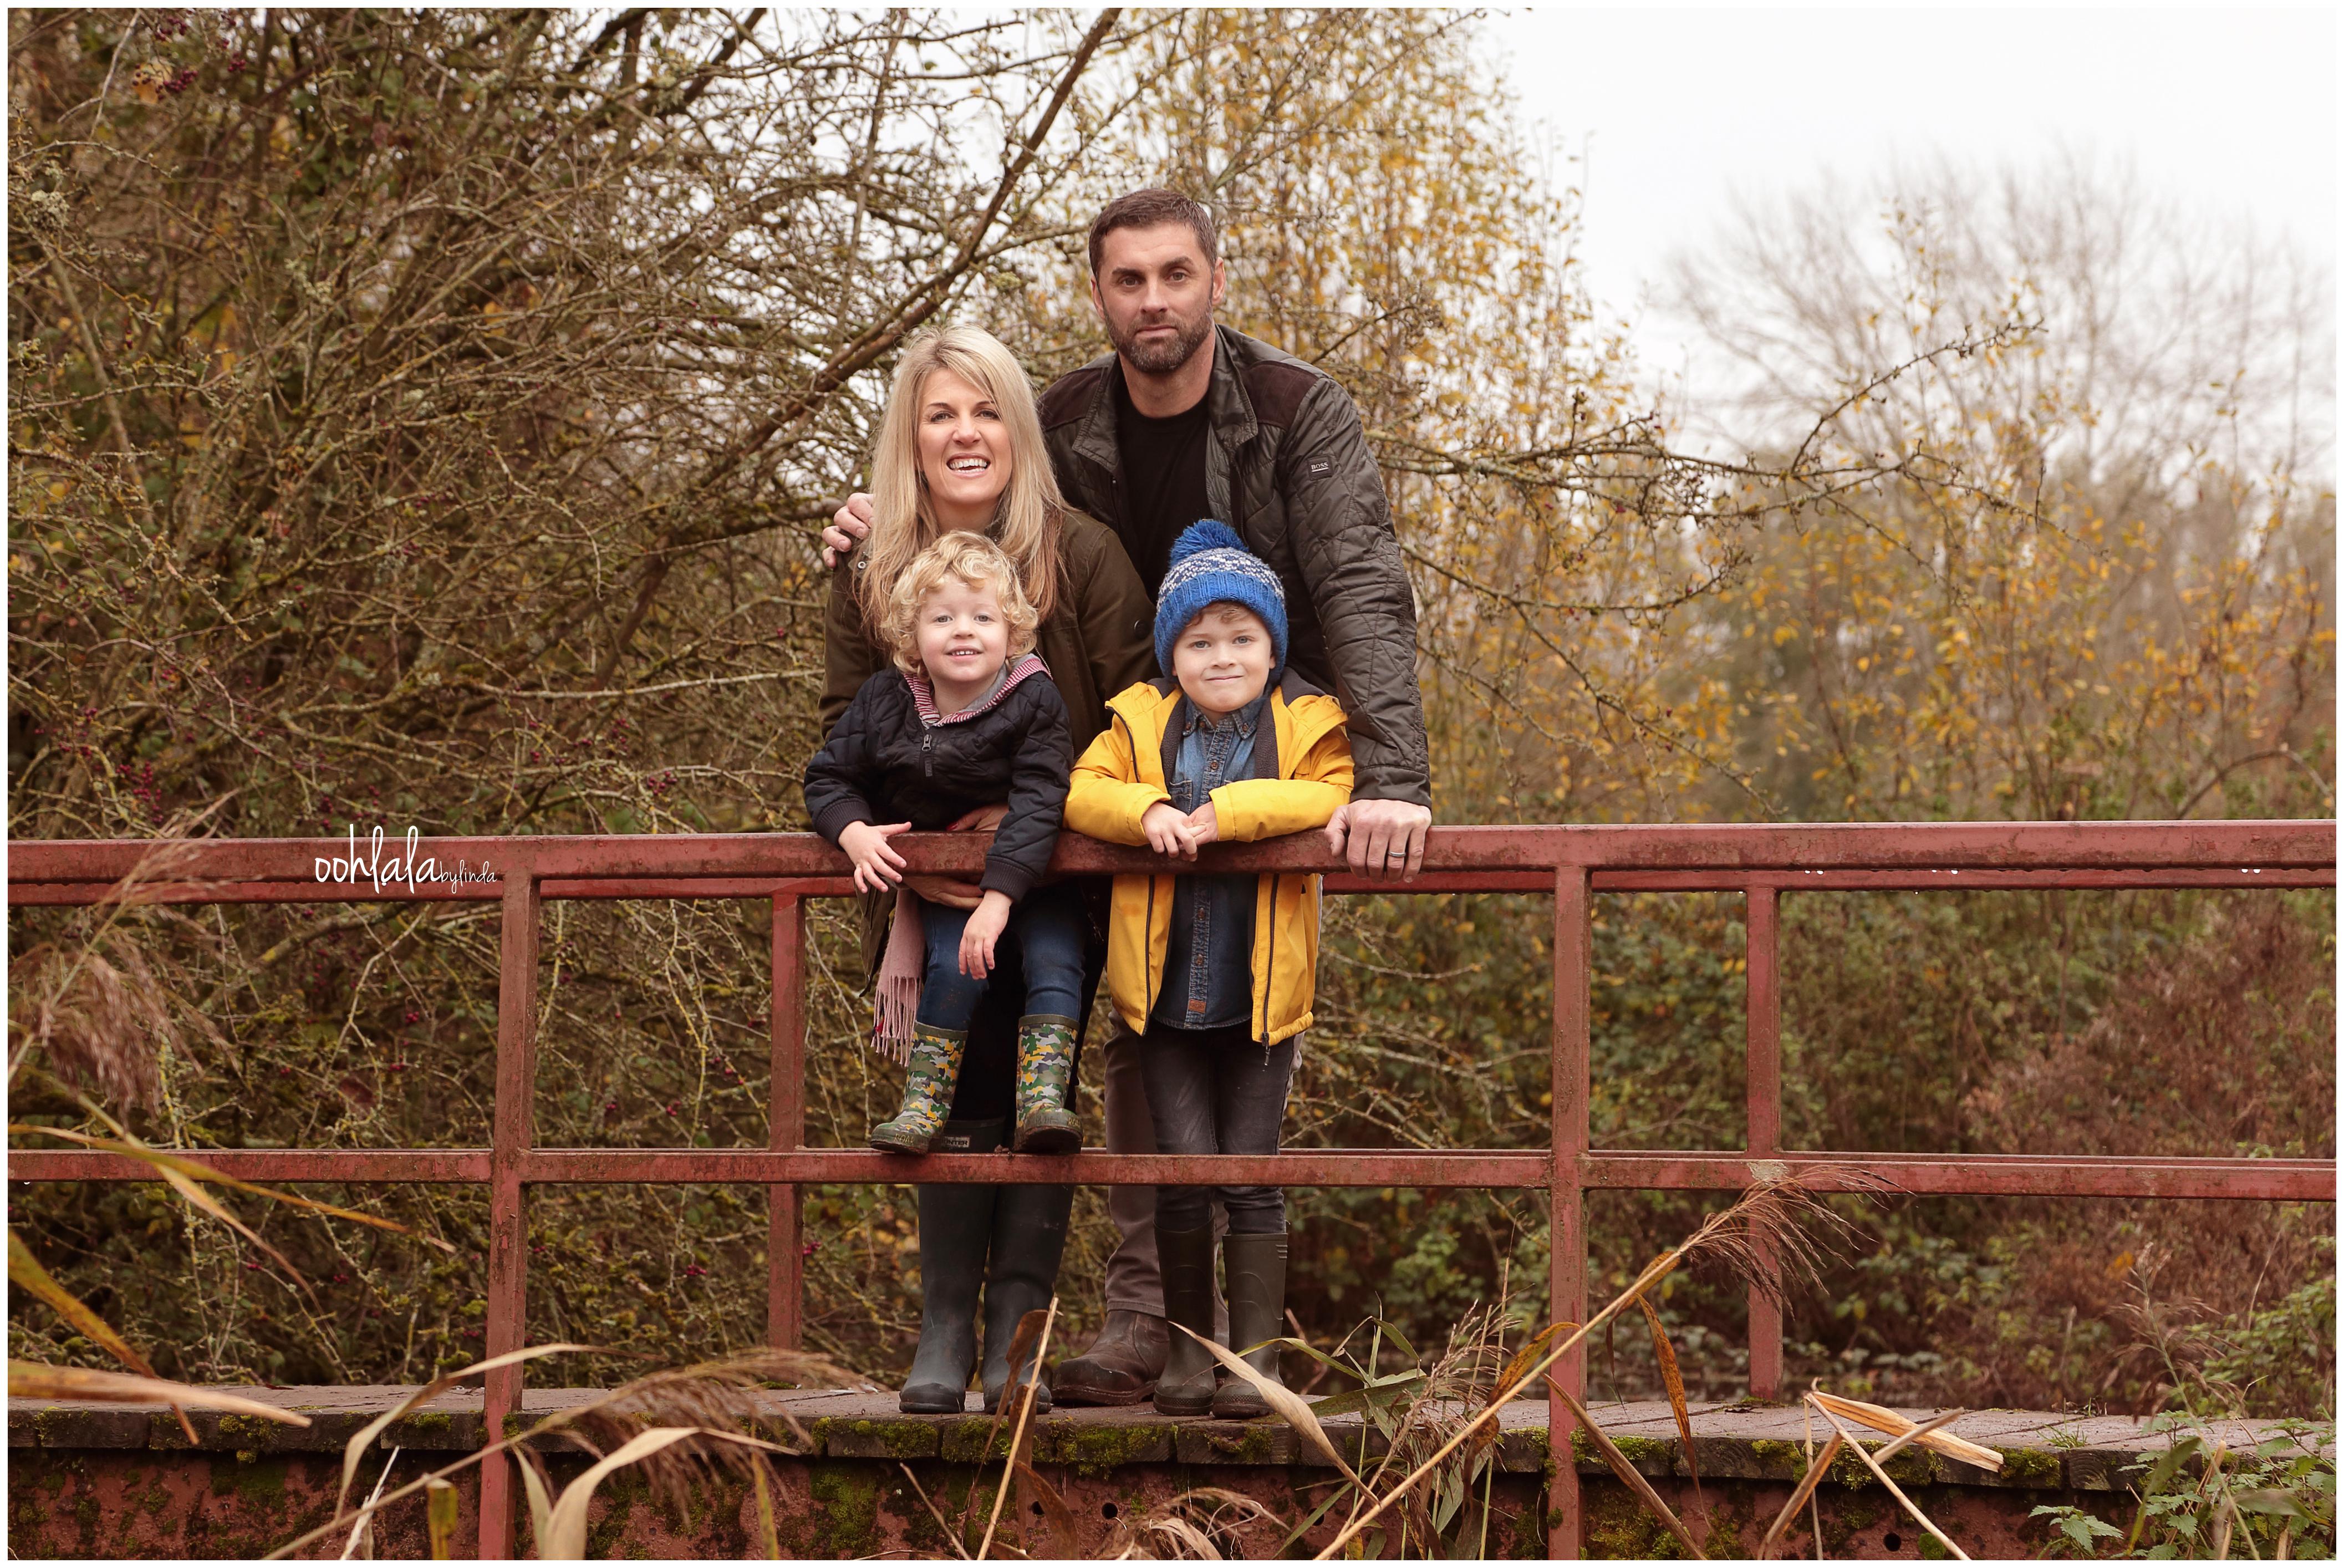 informal family photo shoot at Caldicot Castle